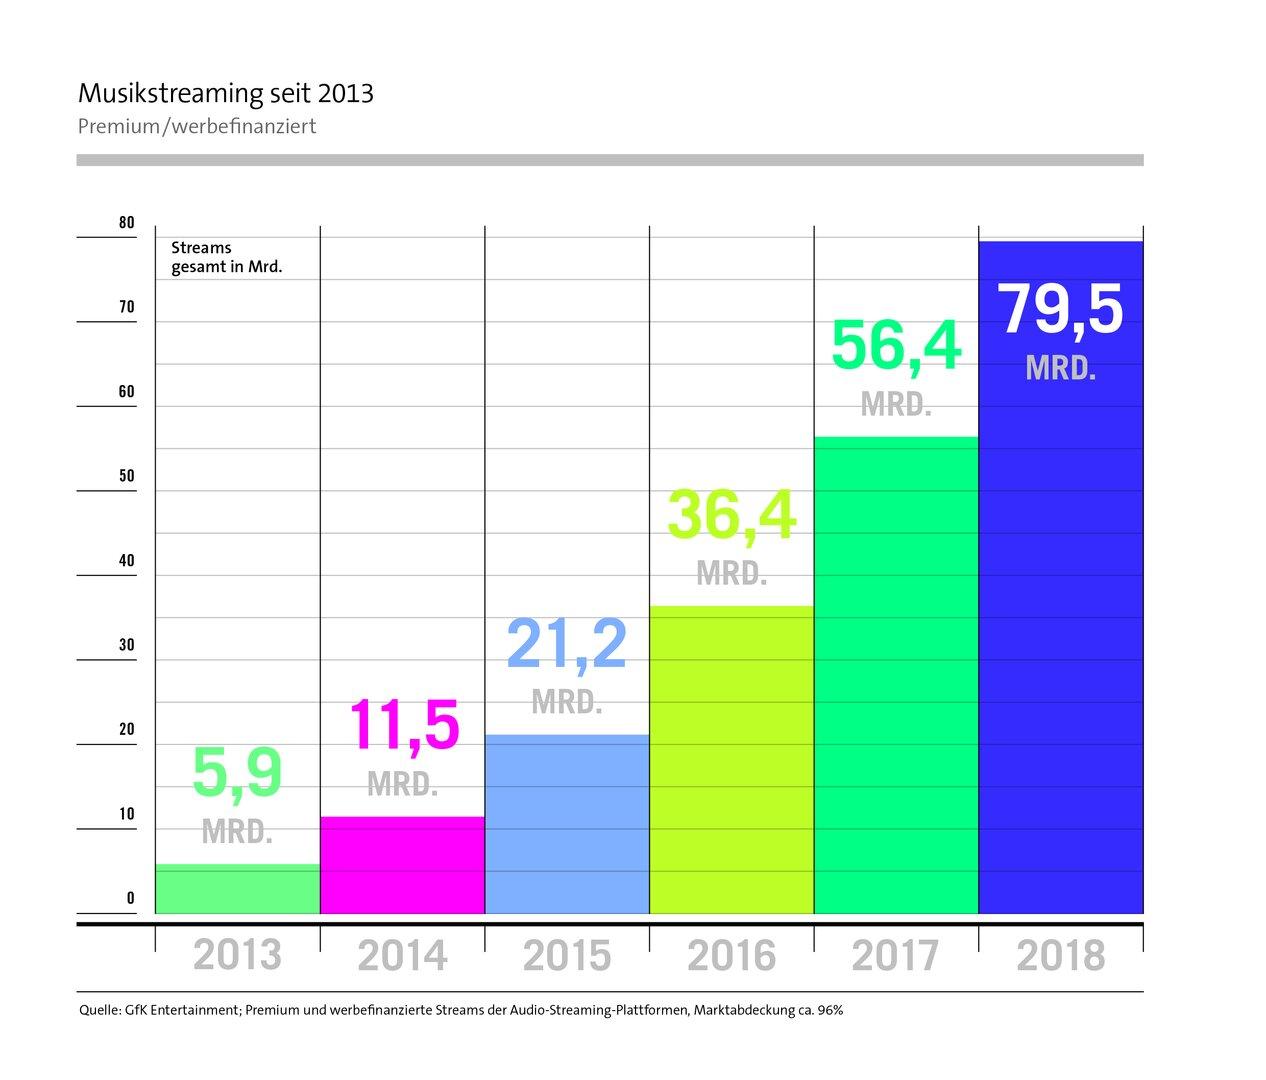 Musikstreaming Premium/werbefinanziert 2018